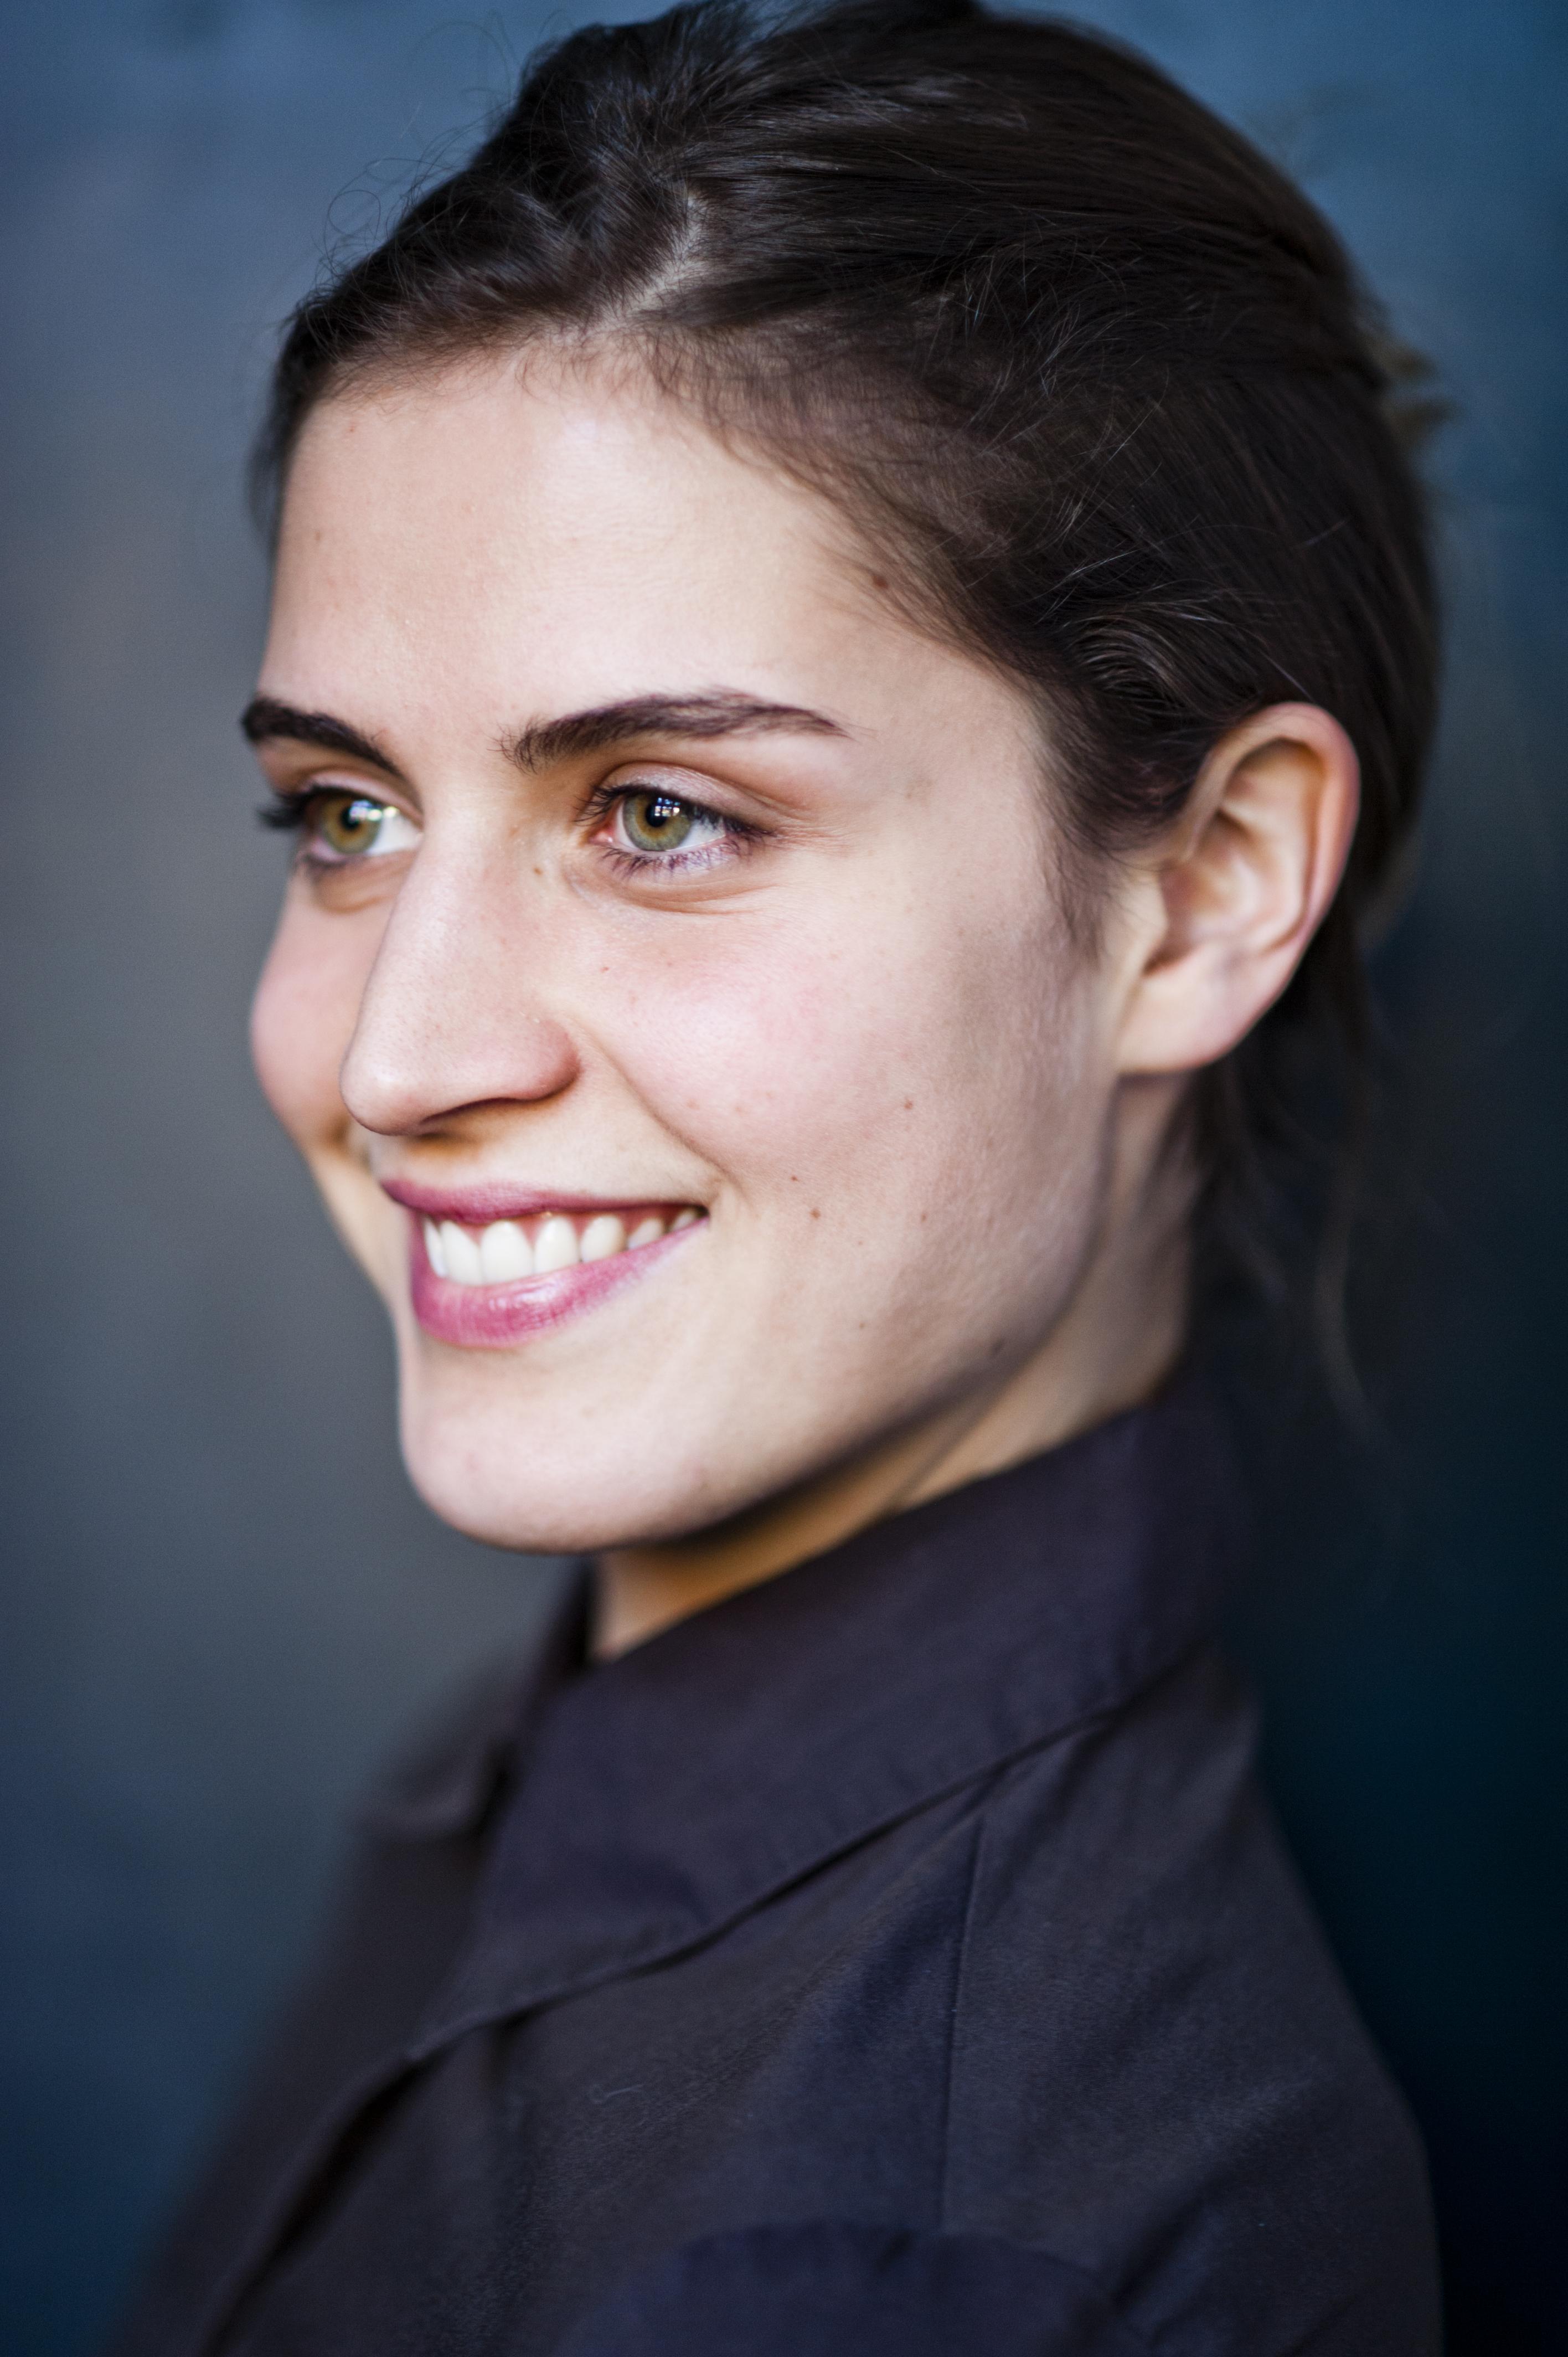 Morgane Ferru In Sensor An Der Deutschen Oper Berlin